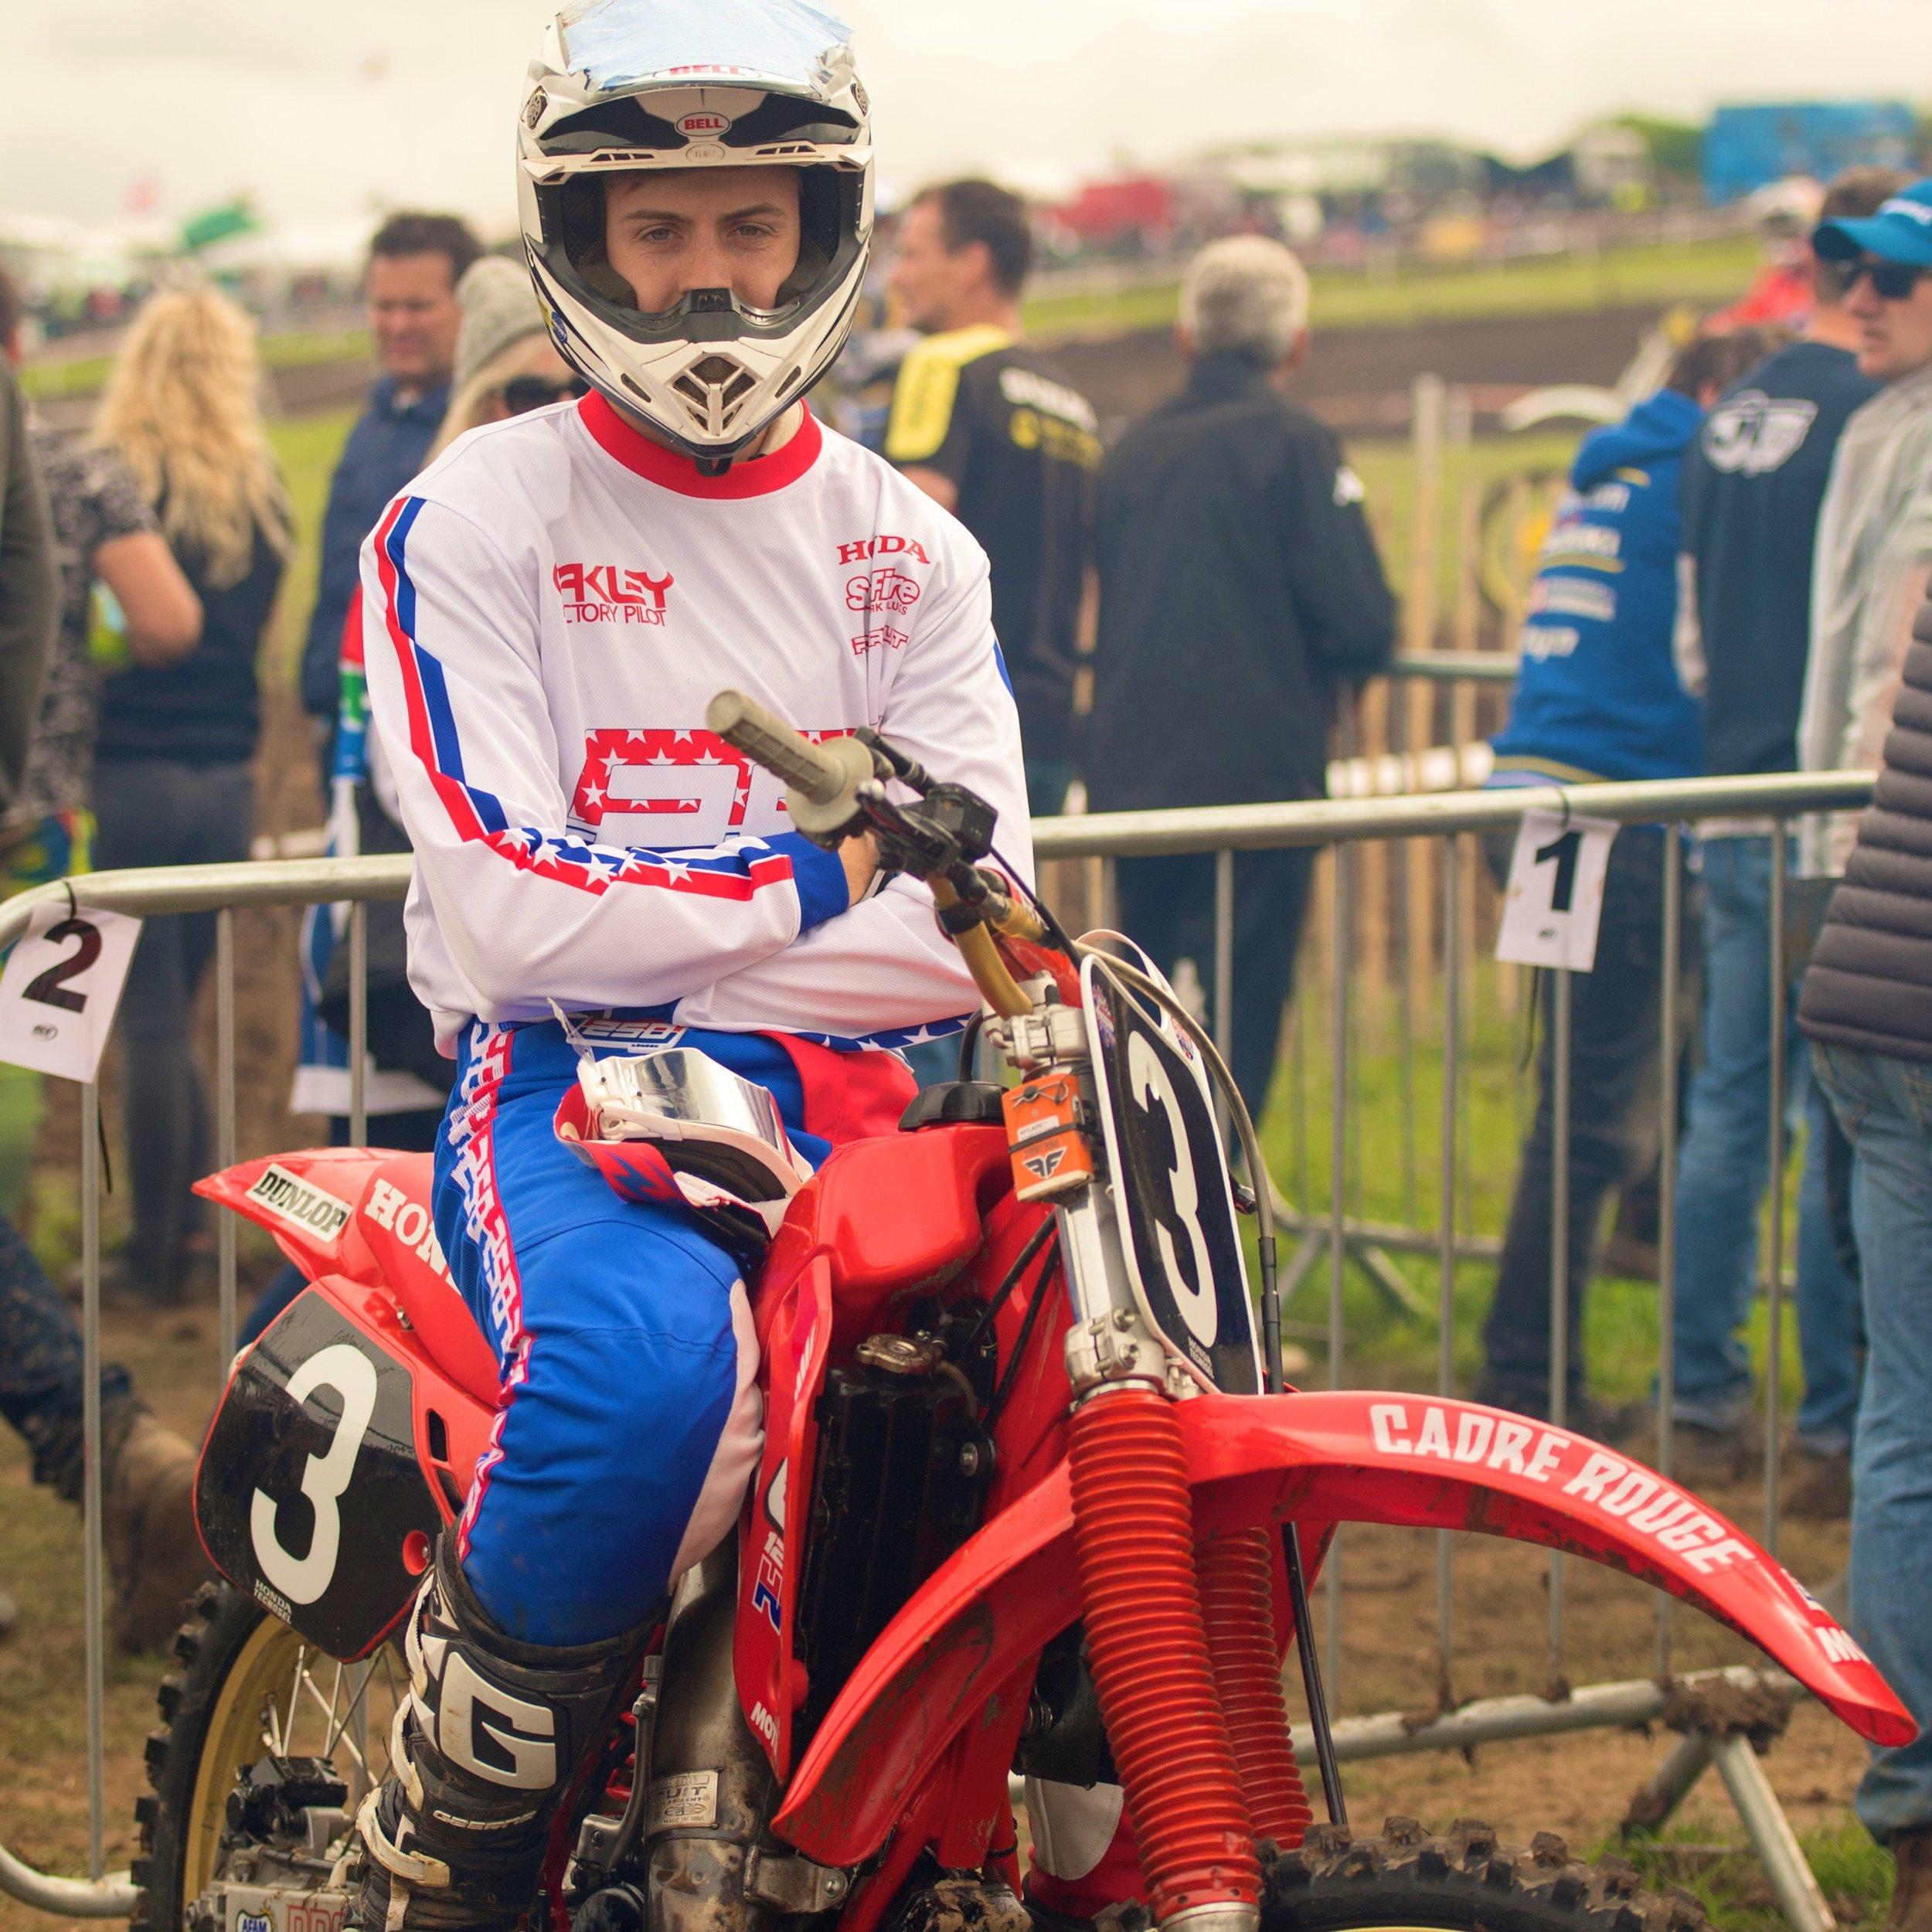 Bradley Doyle, 250LONDON Factory Rider. Image by Colin Hambridge